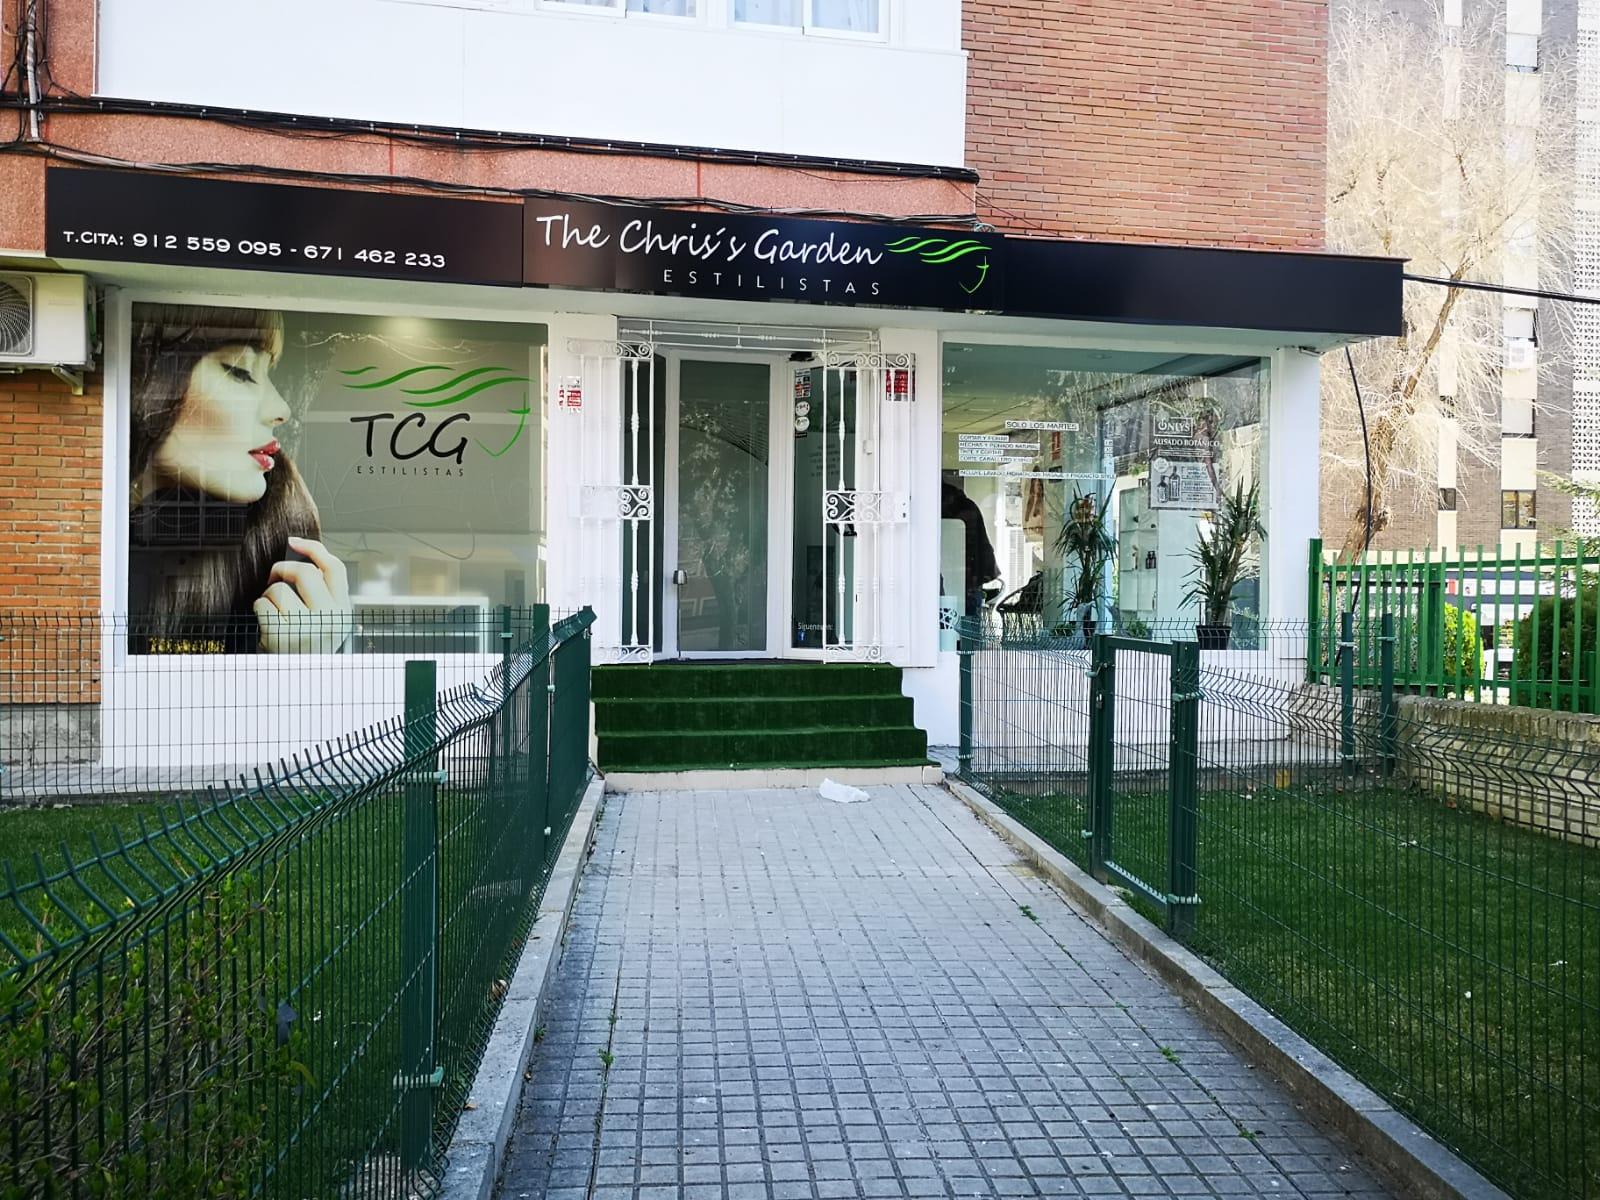 The Chris's Garden salón de belleza unisex con tratamientos organicos en mostoles